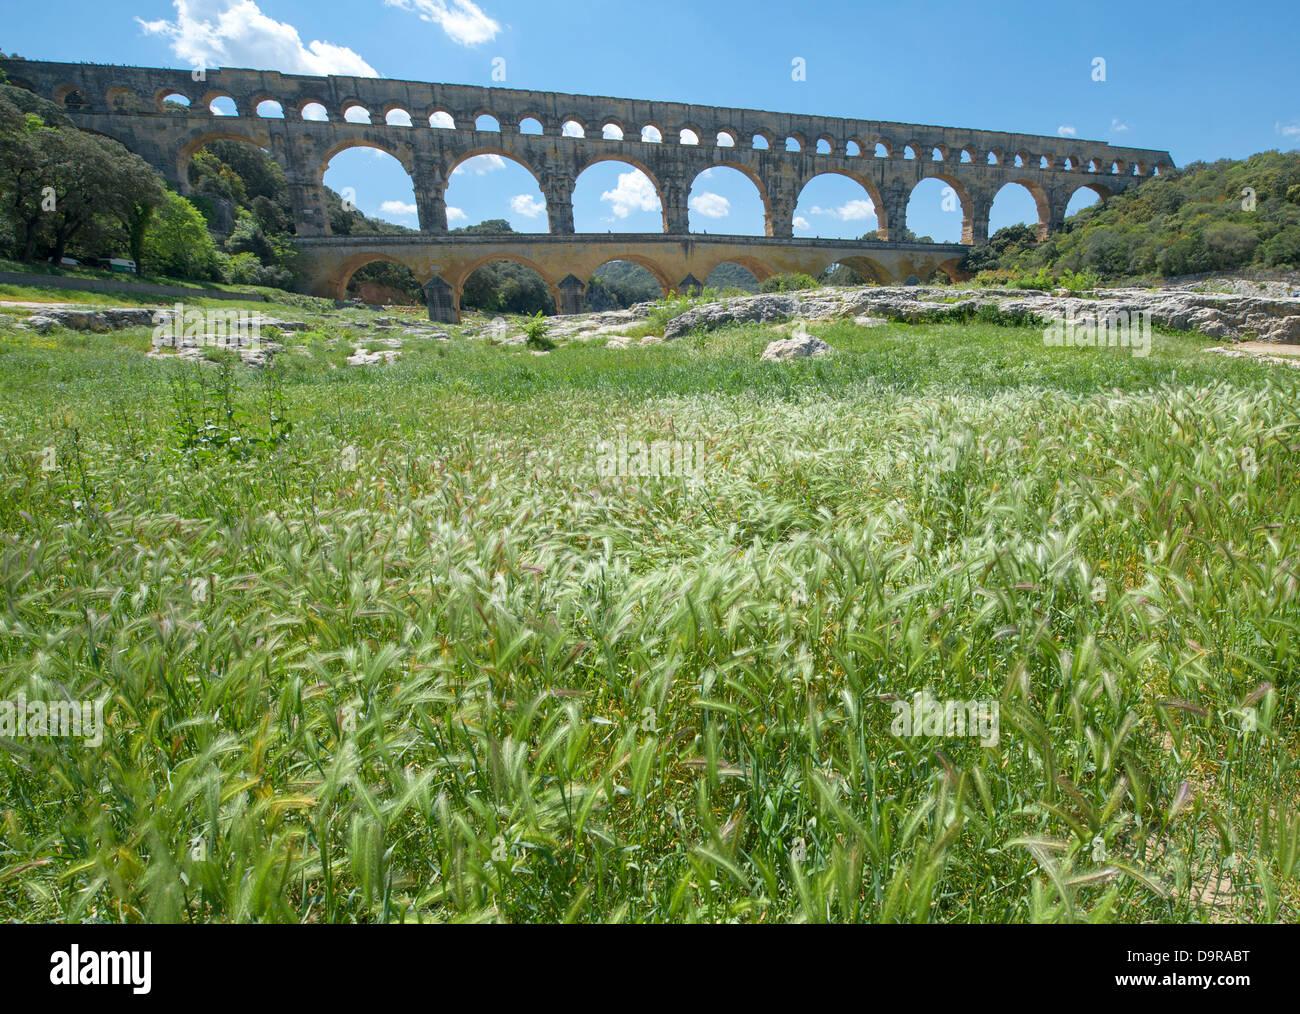 UNESCO world heritage Pont du Gard, a Roman aqueduct near Nîmes in the Gard, seen from the banks of the Gardon - Stock Image